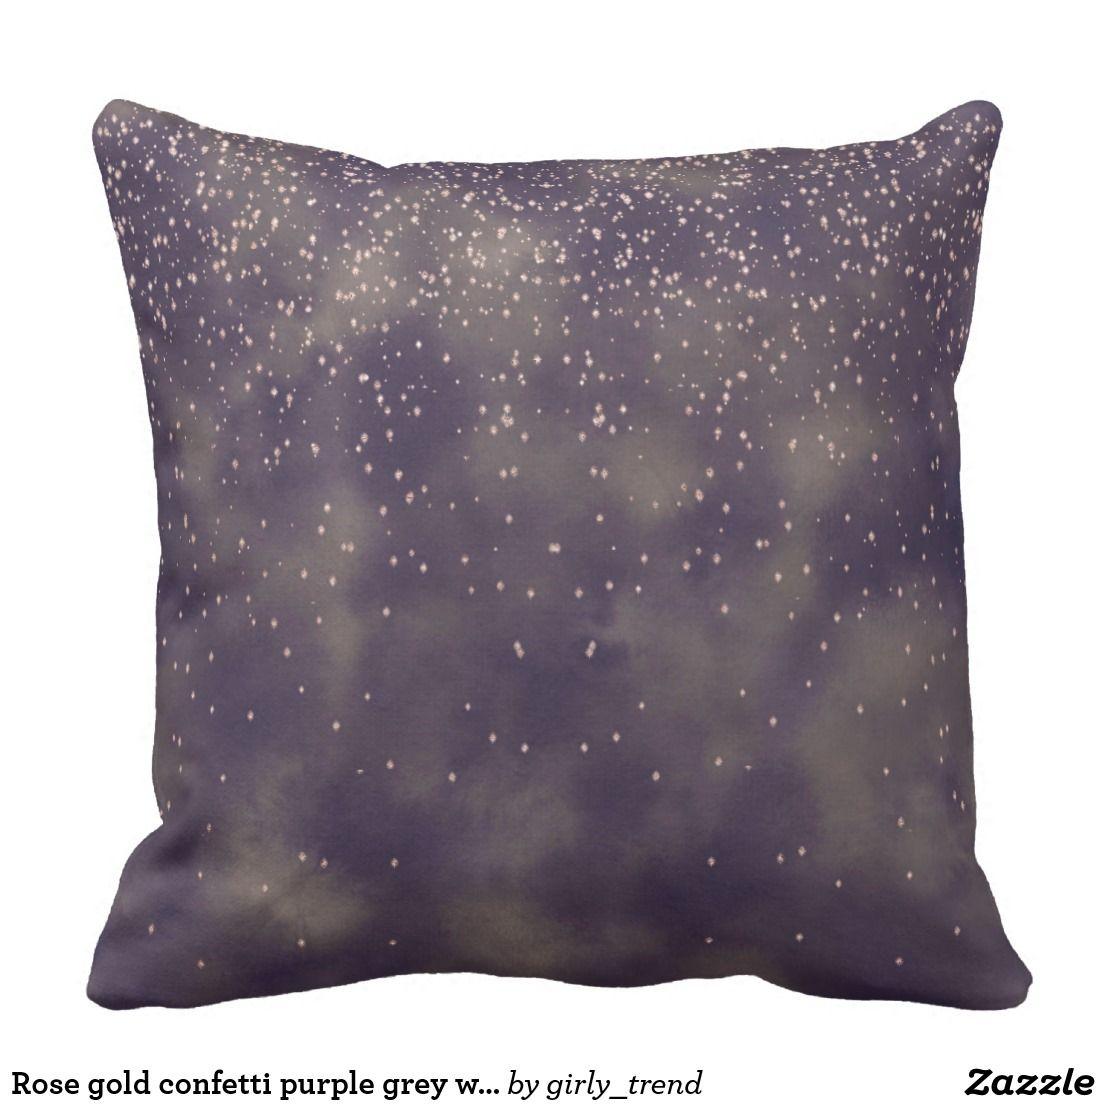 Rose gold confetti purple grey watercolor batik outdoor pillow ...